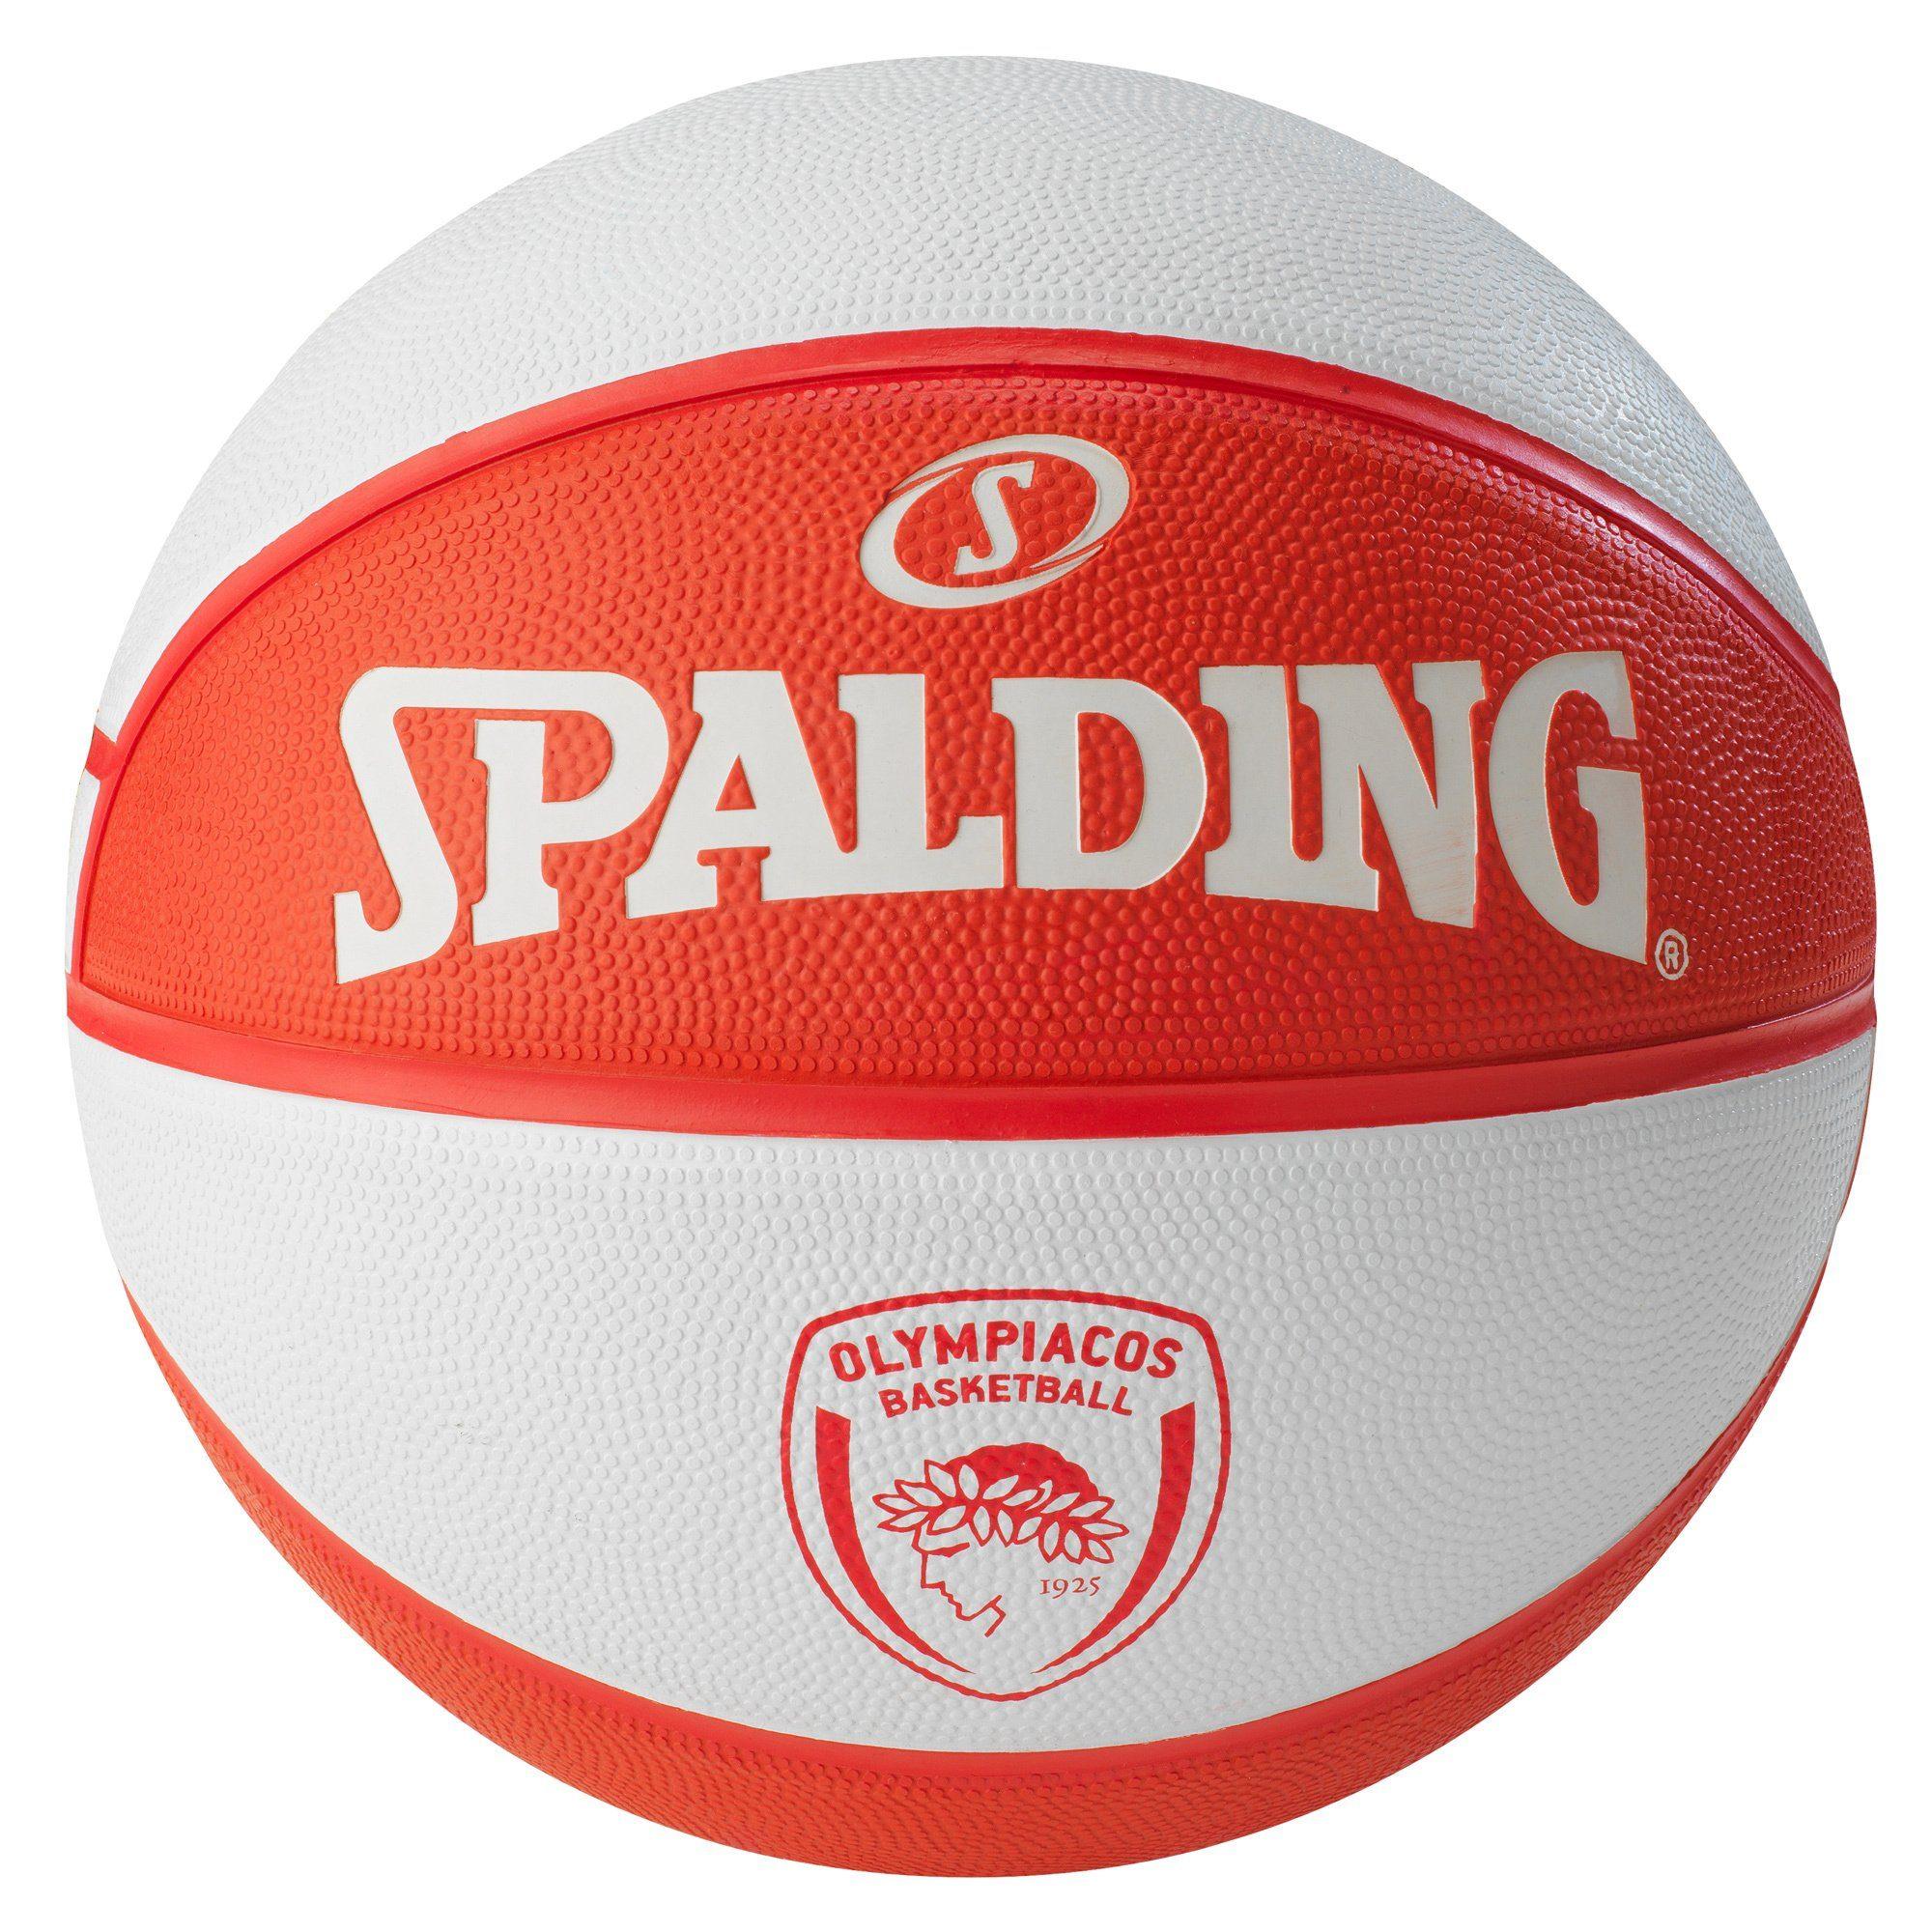 SPALDING ELTeam Olympiacos Basketball